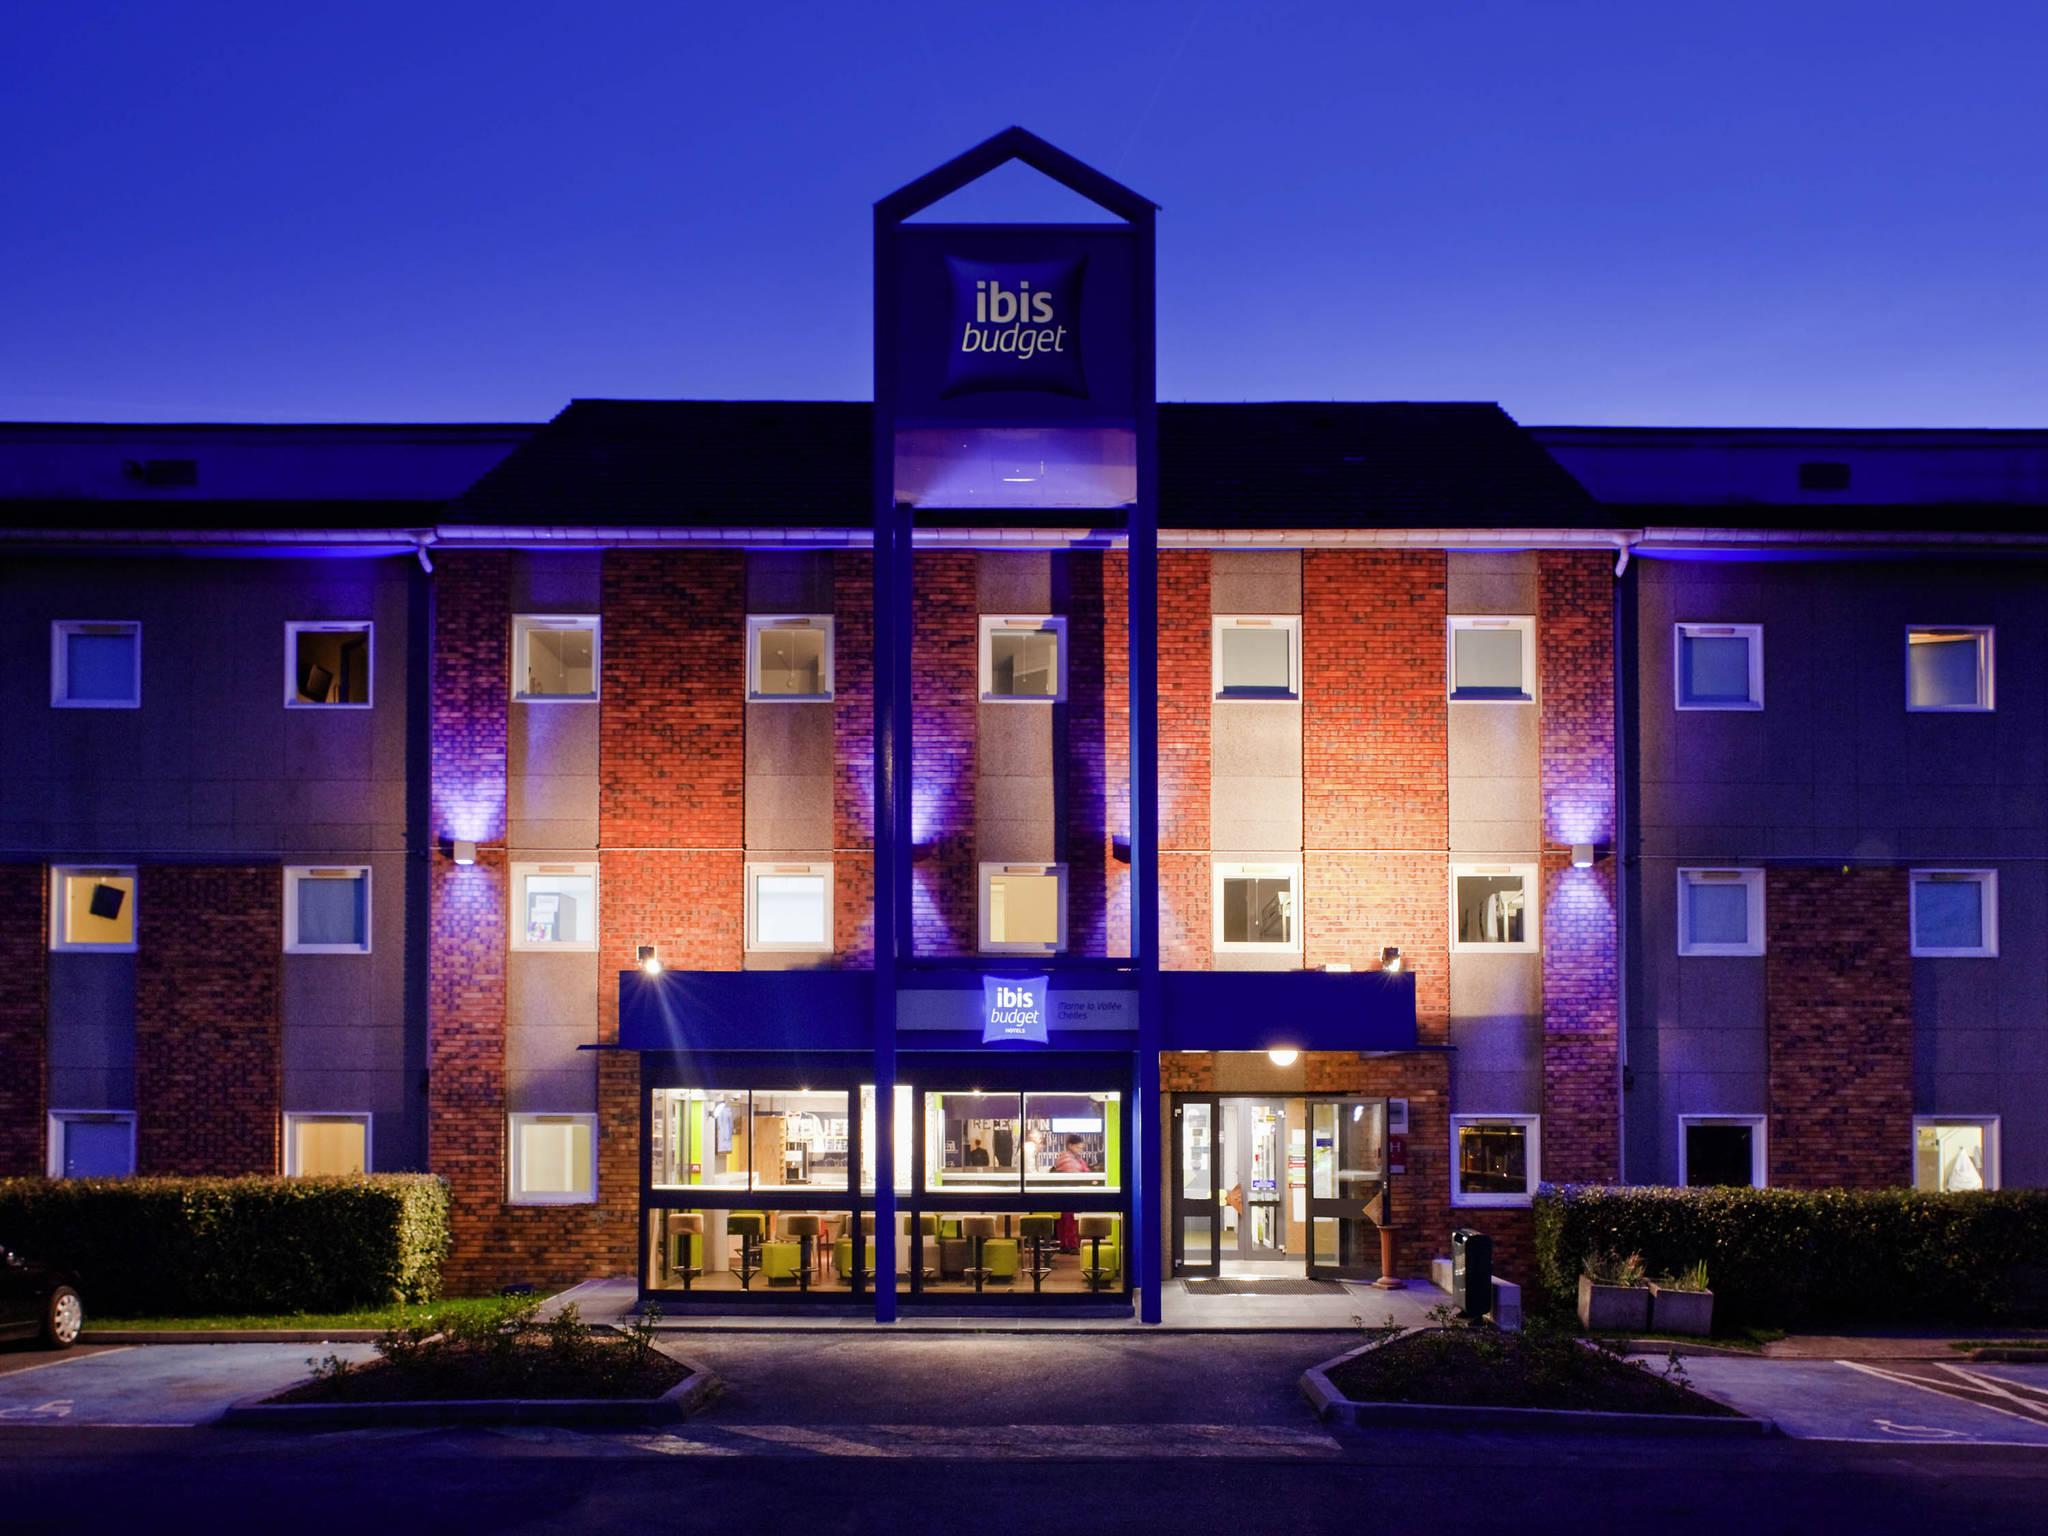 Hotel - ibis budget Marne la Vallée Chelles